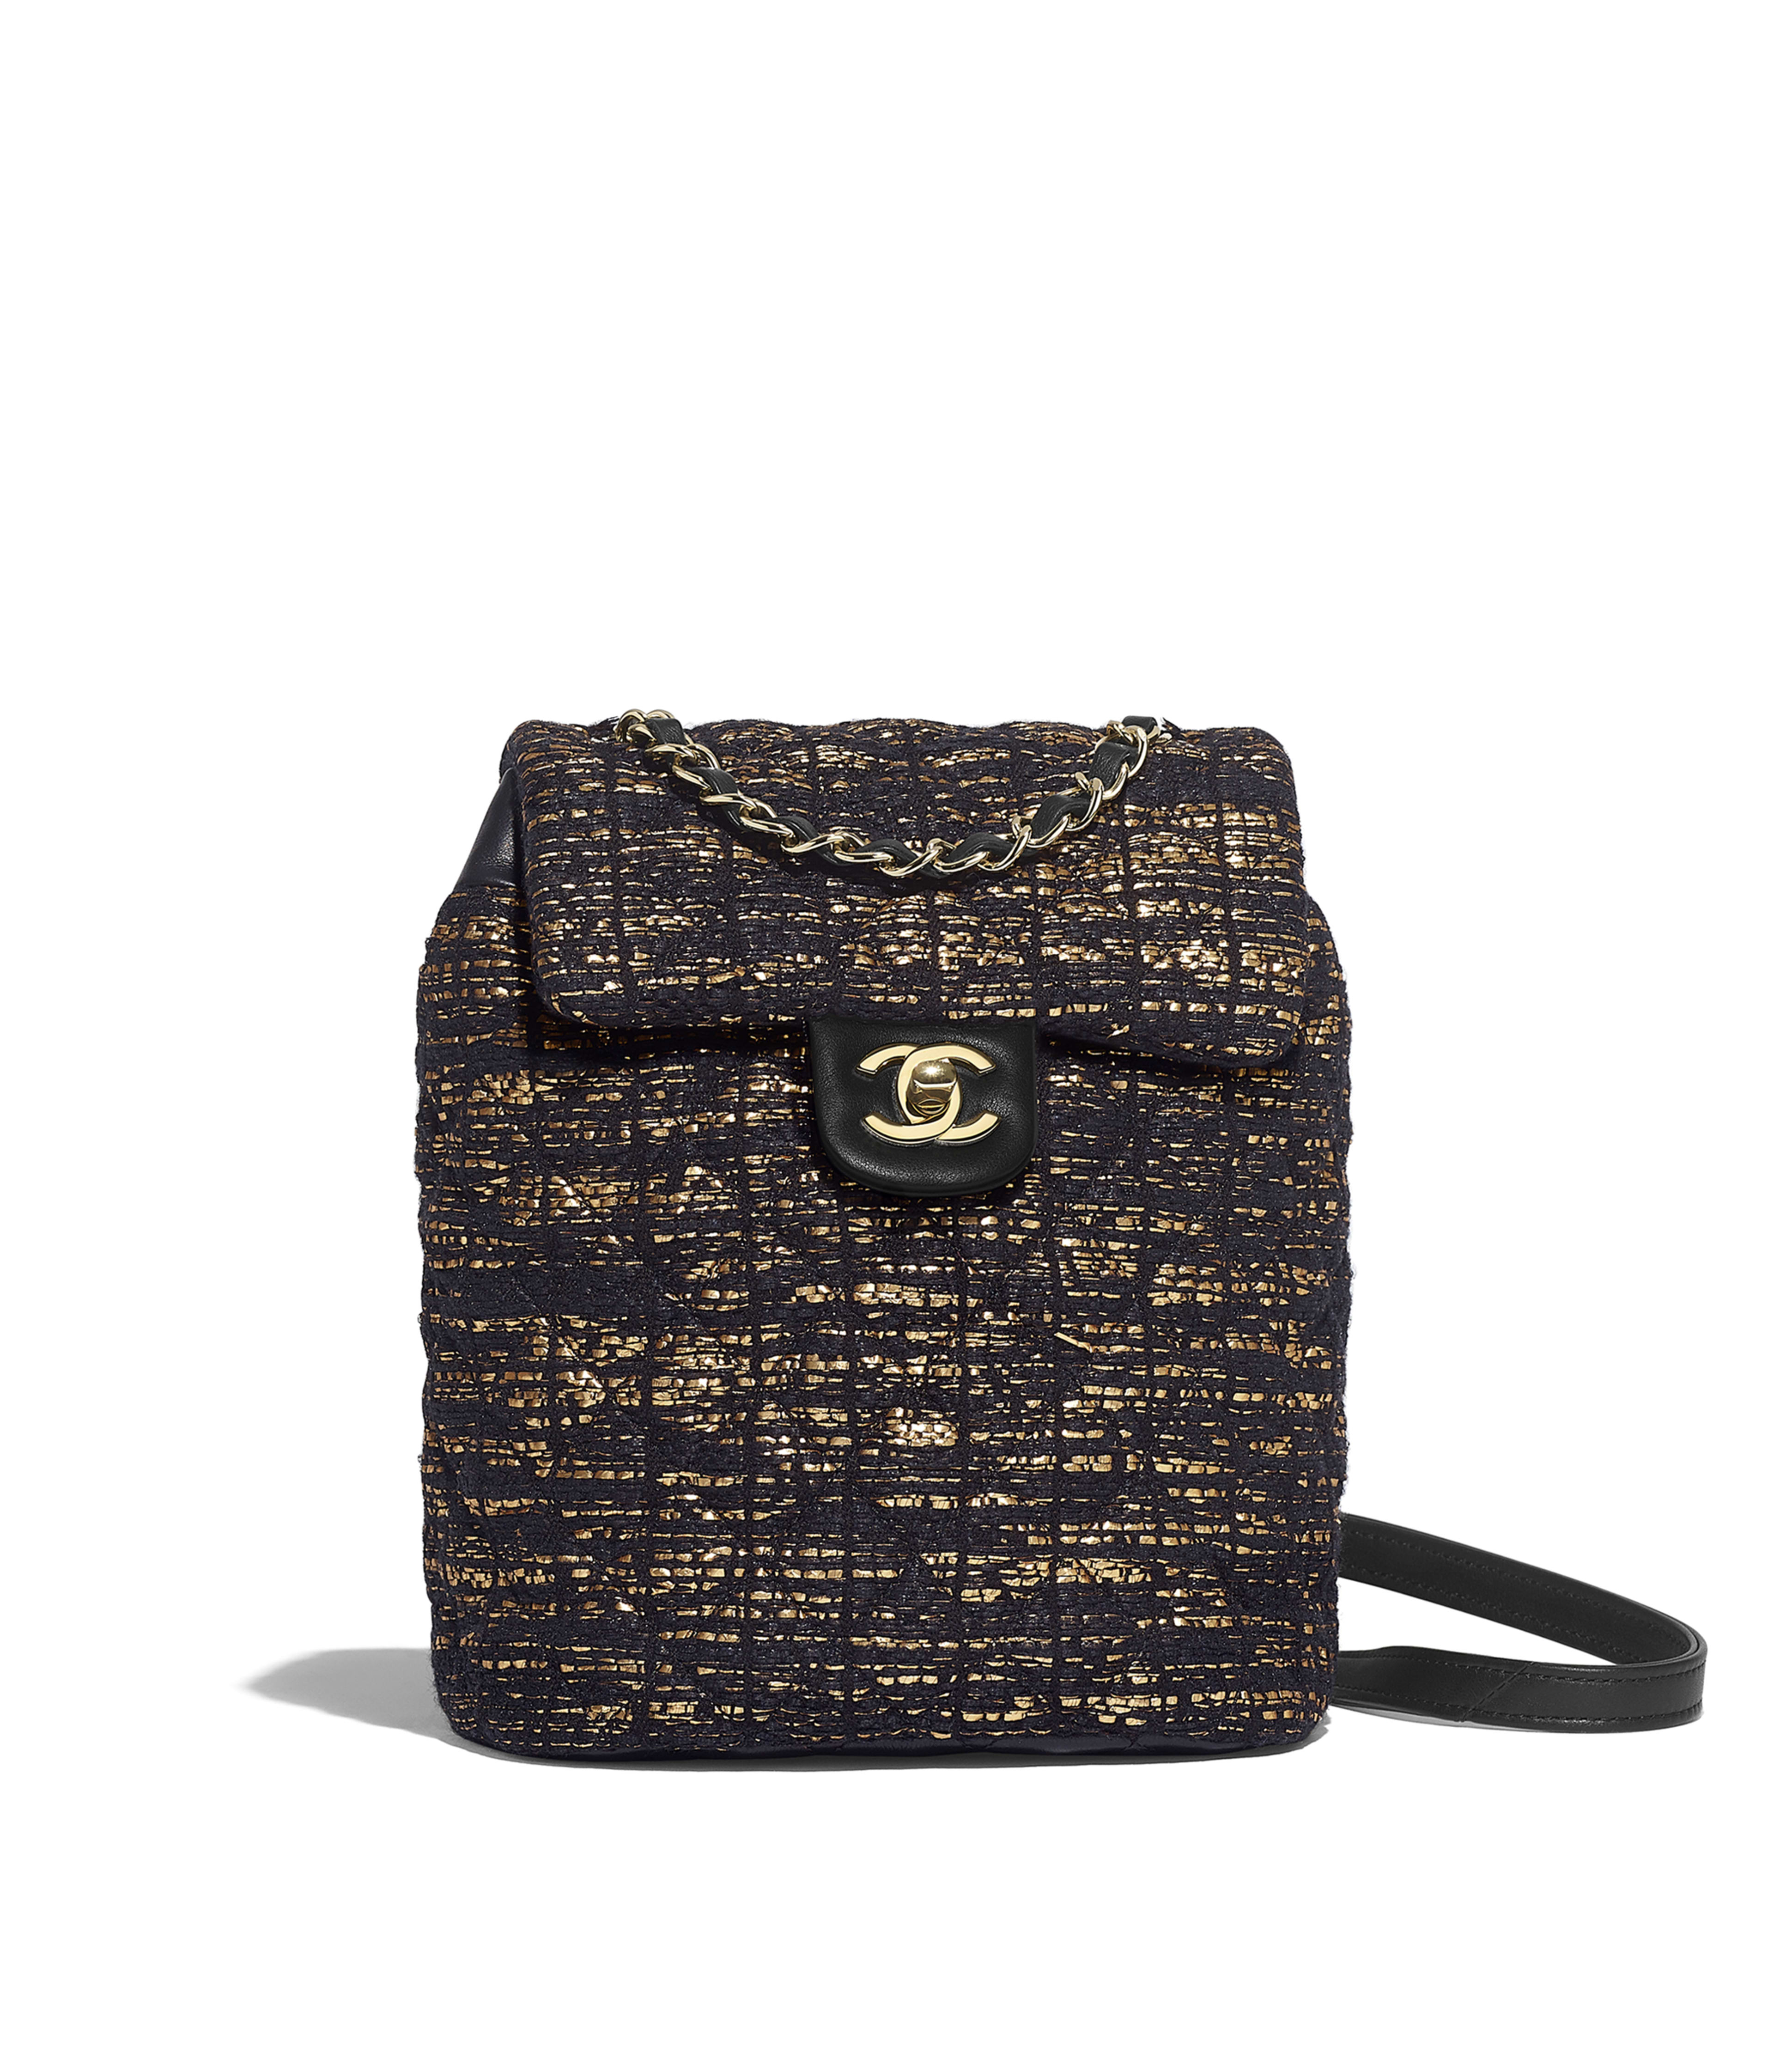 3621209f98c6 Backpack Tweed & Gold-Tone Metal, Black & Gold Ref. A69964B01091MG458